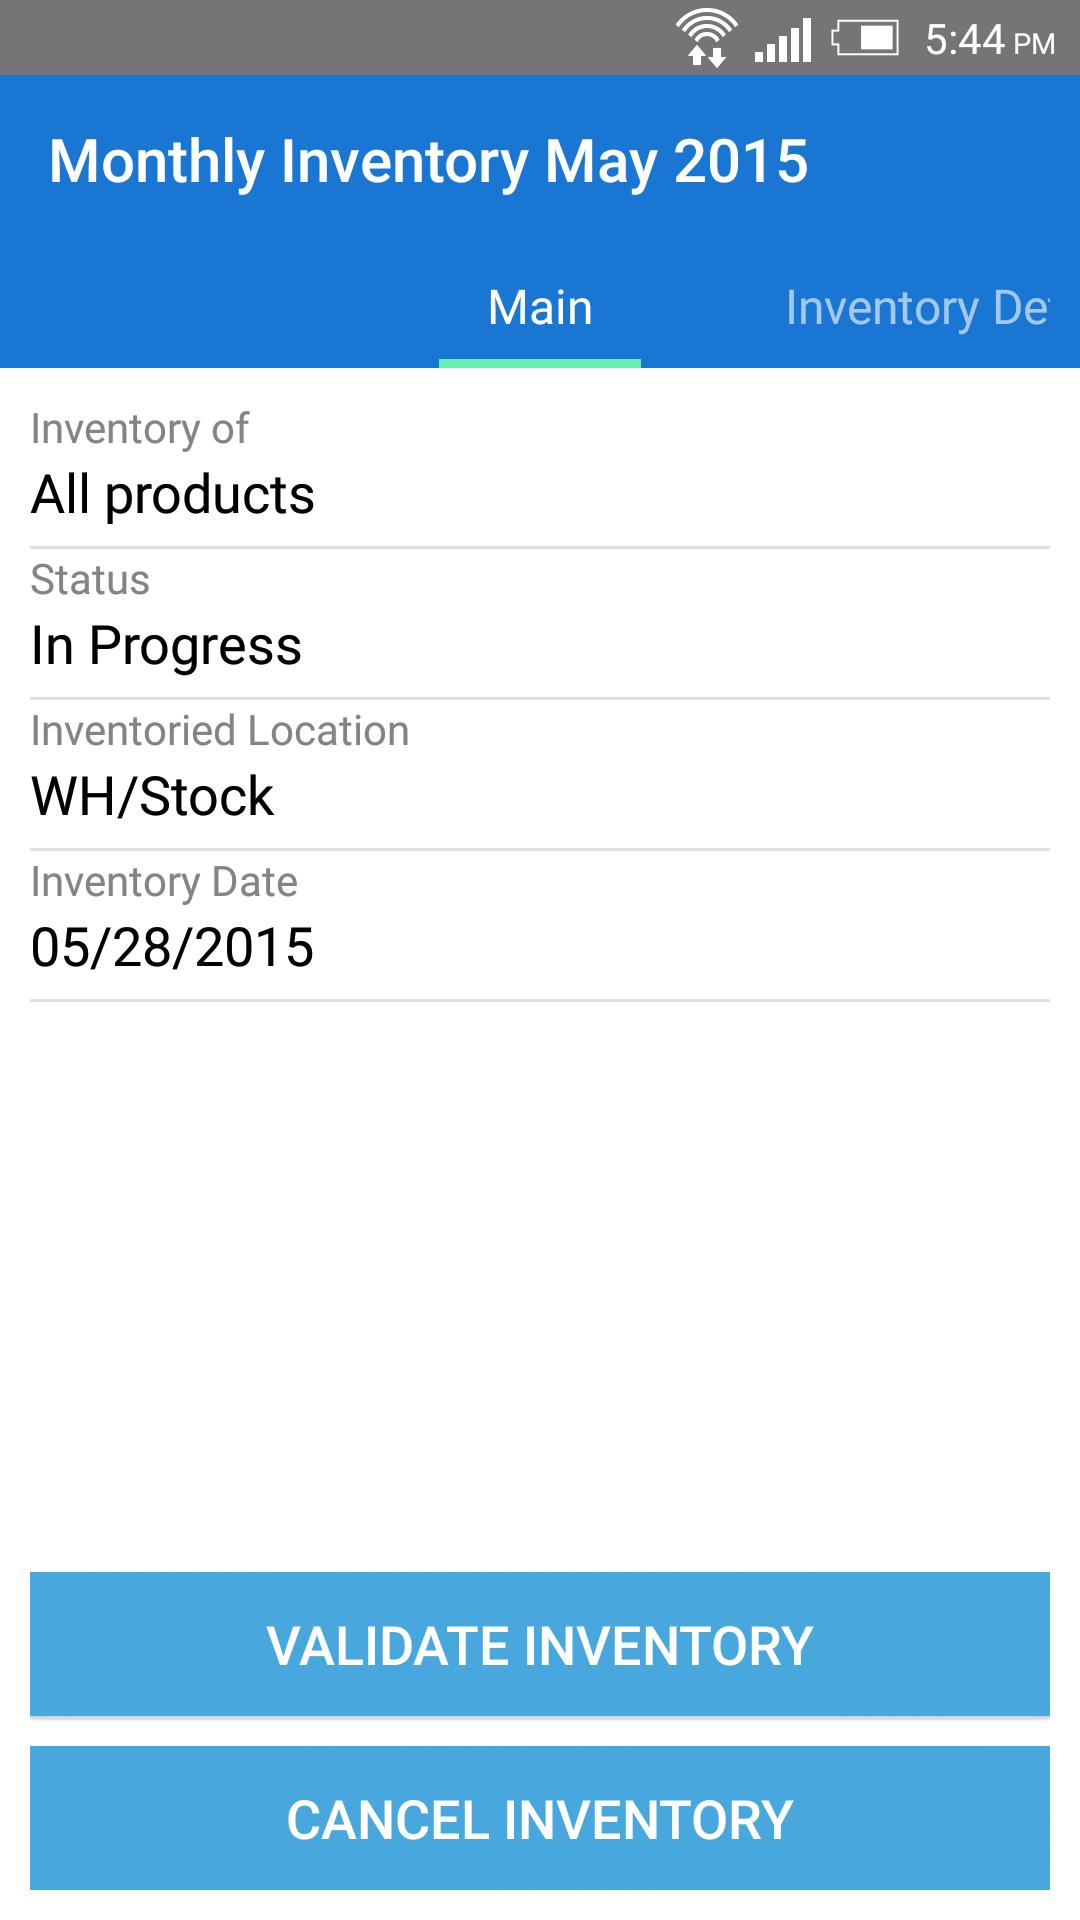 mERP_Warehouse_Inventory5